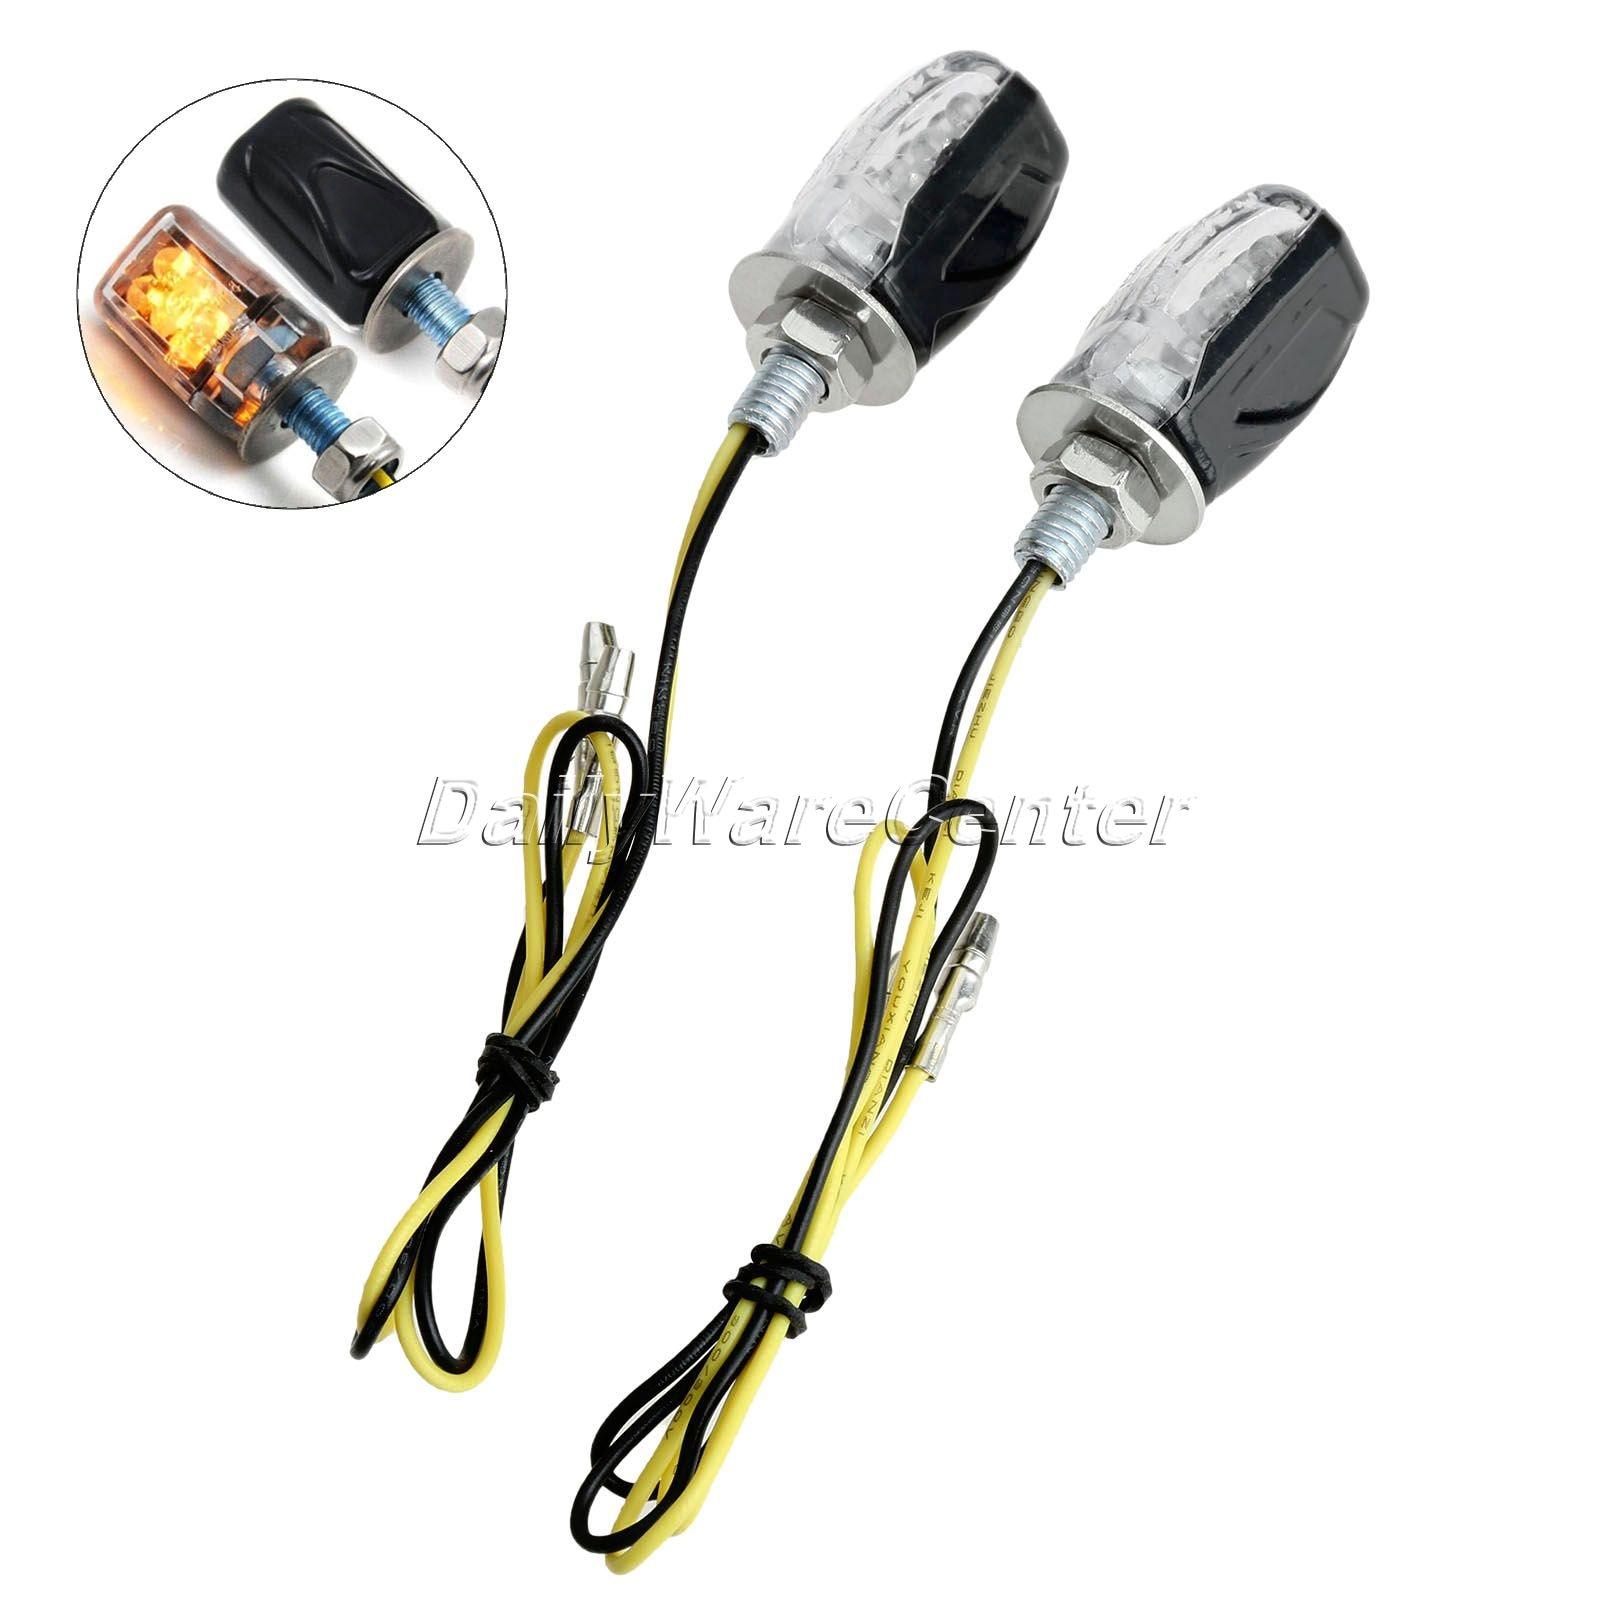 2x Motorcycle Led Turn Signal Indicator Light Lamp 6 LED Amber Light Universal Blinker Flashers For Honda Kawasaki Suzuki Yamaha